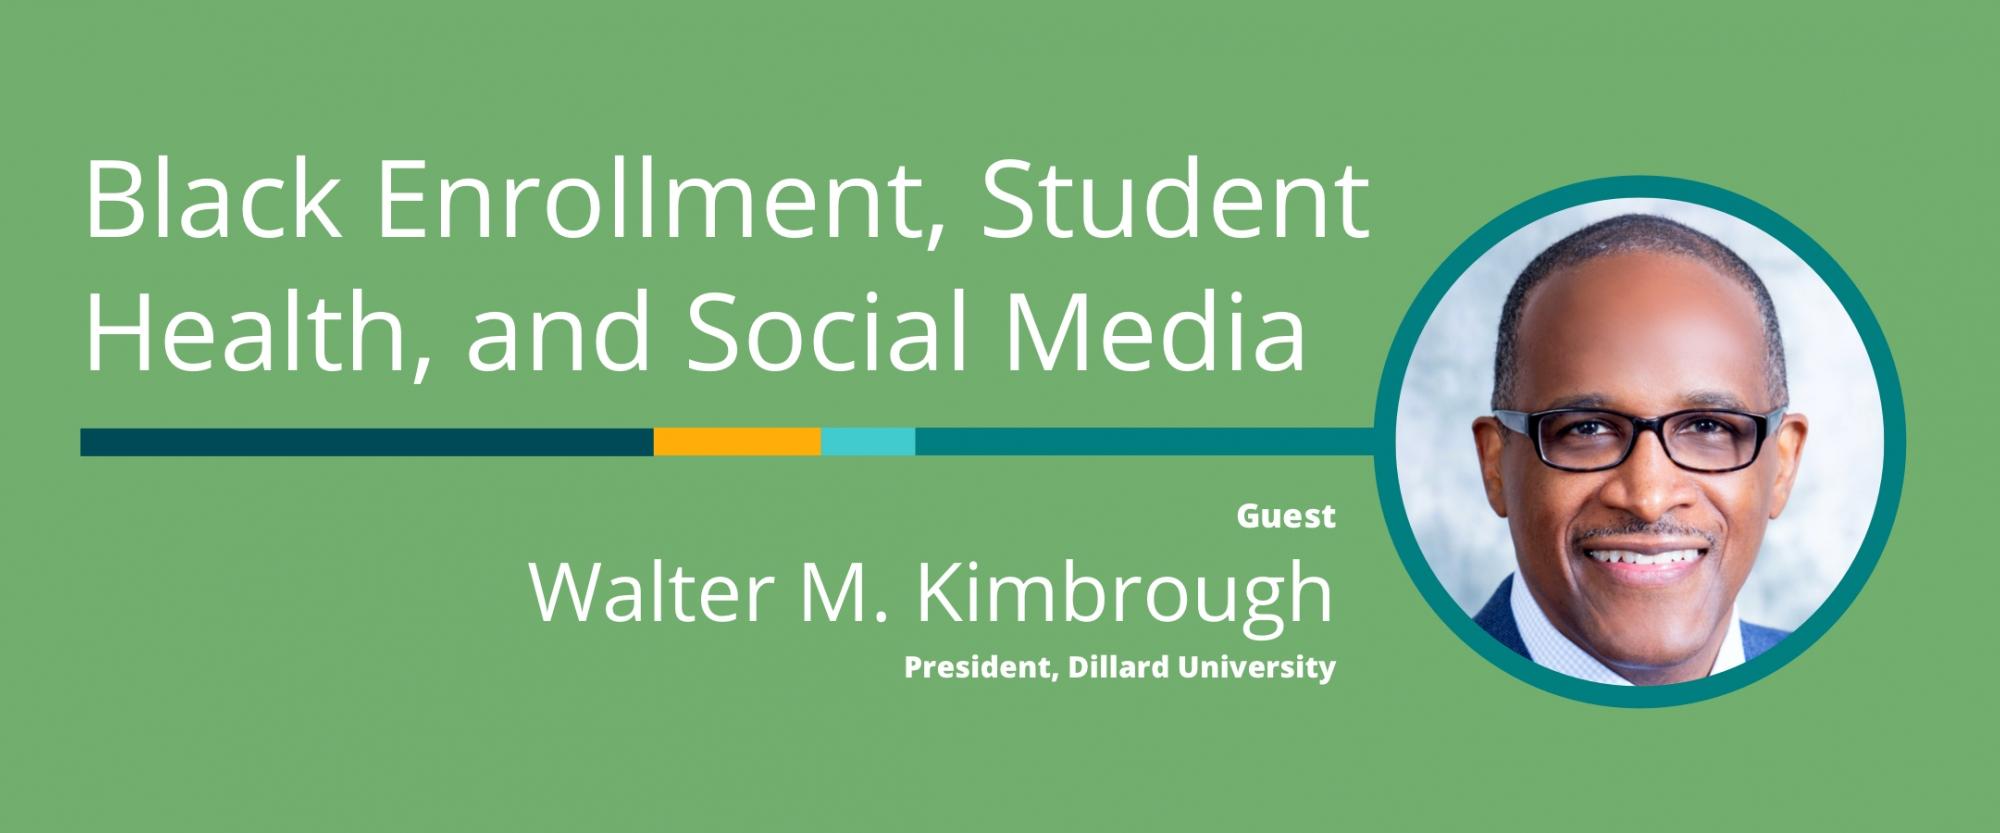 Black Enrollment, Student Health, and Social Media: A Conversation With Walter M. Kimbrough, Dillard University President